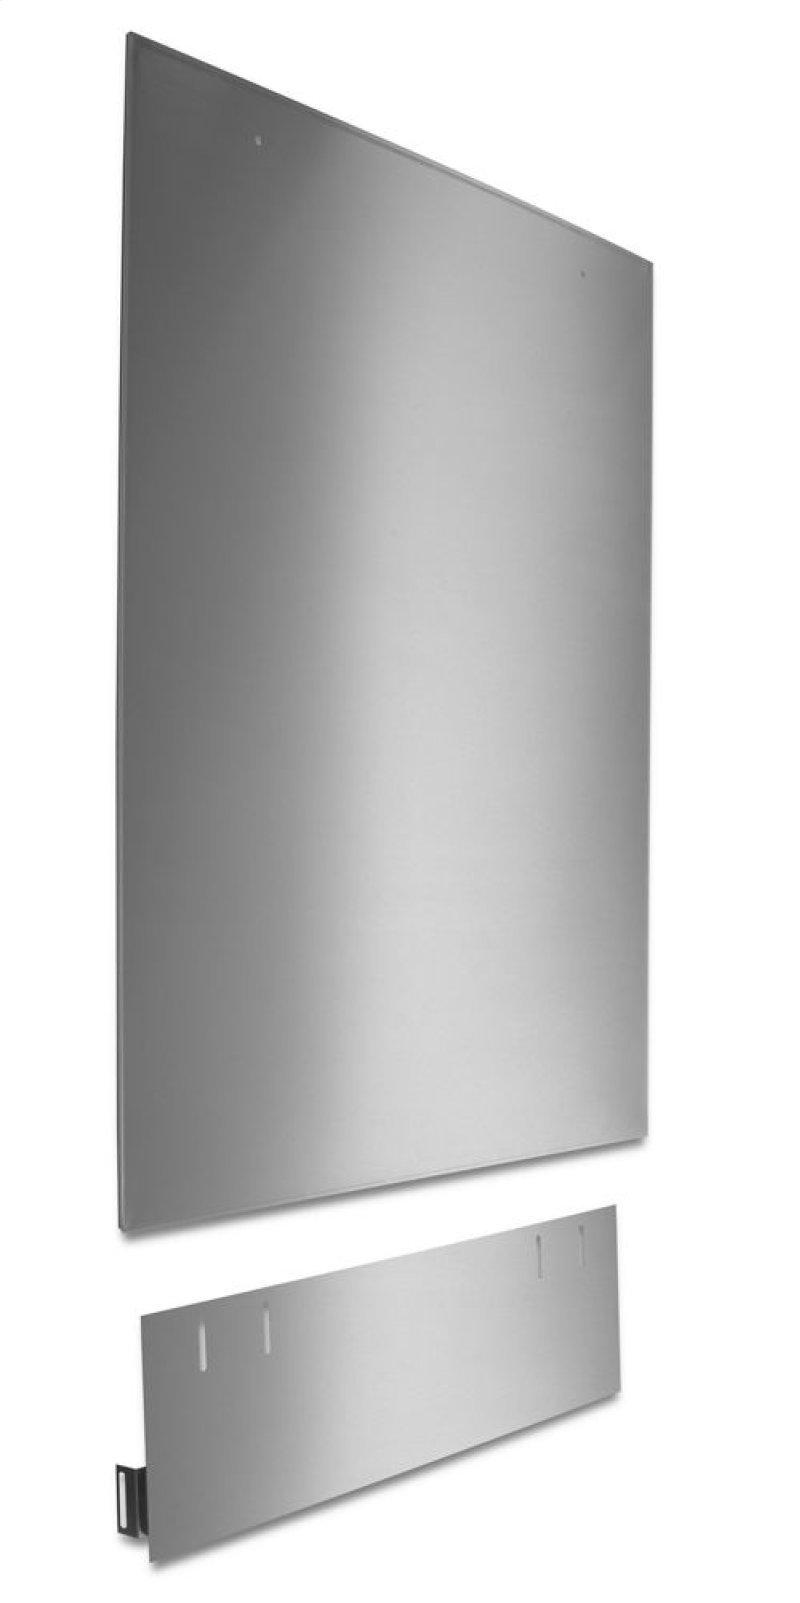 Refrigerator Cover Panels Kits Bing Images